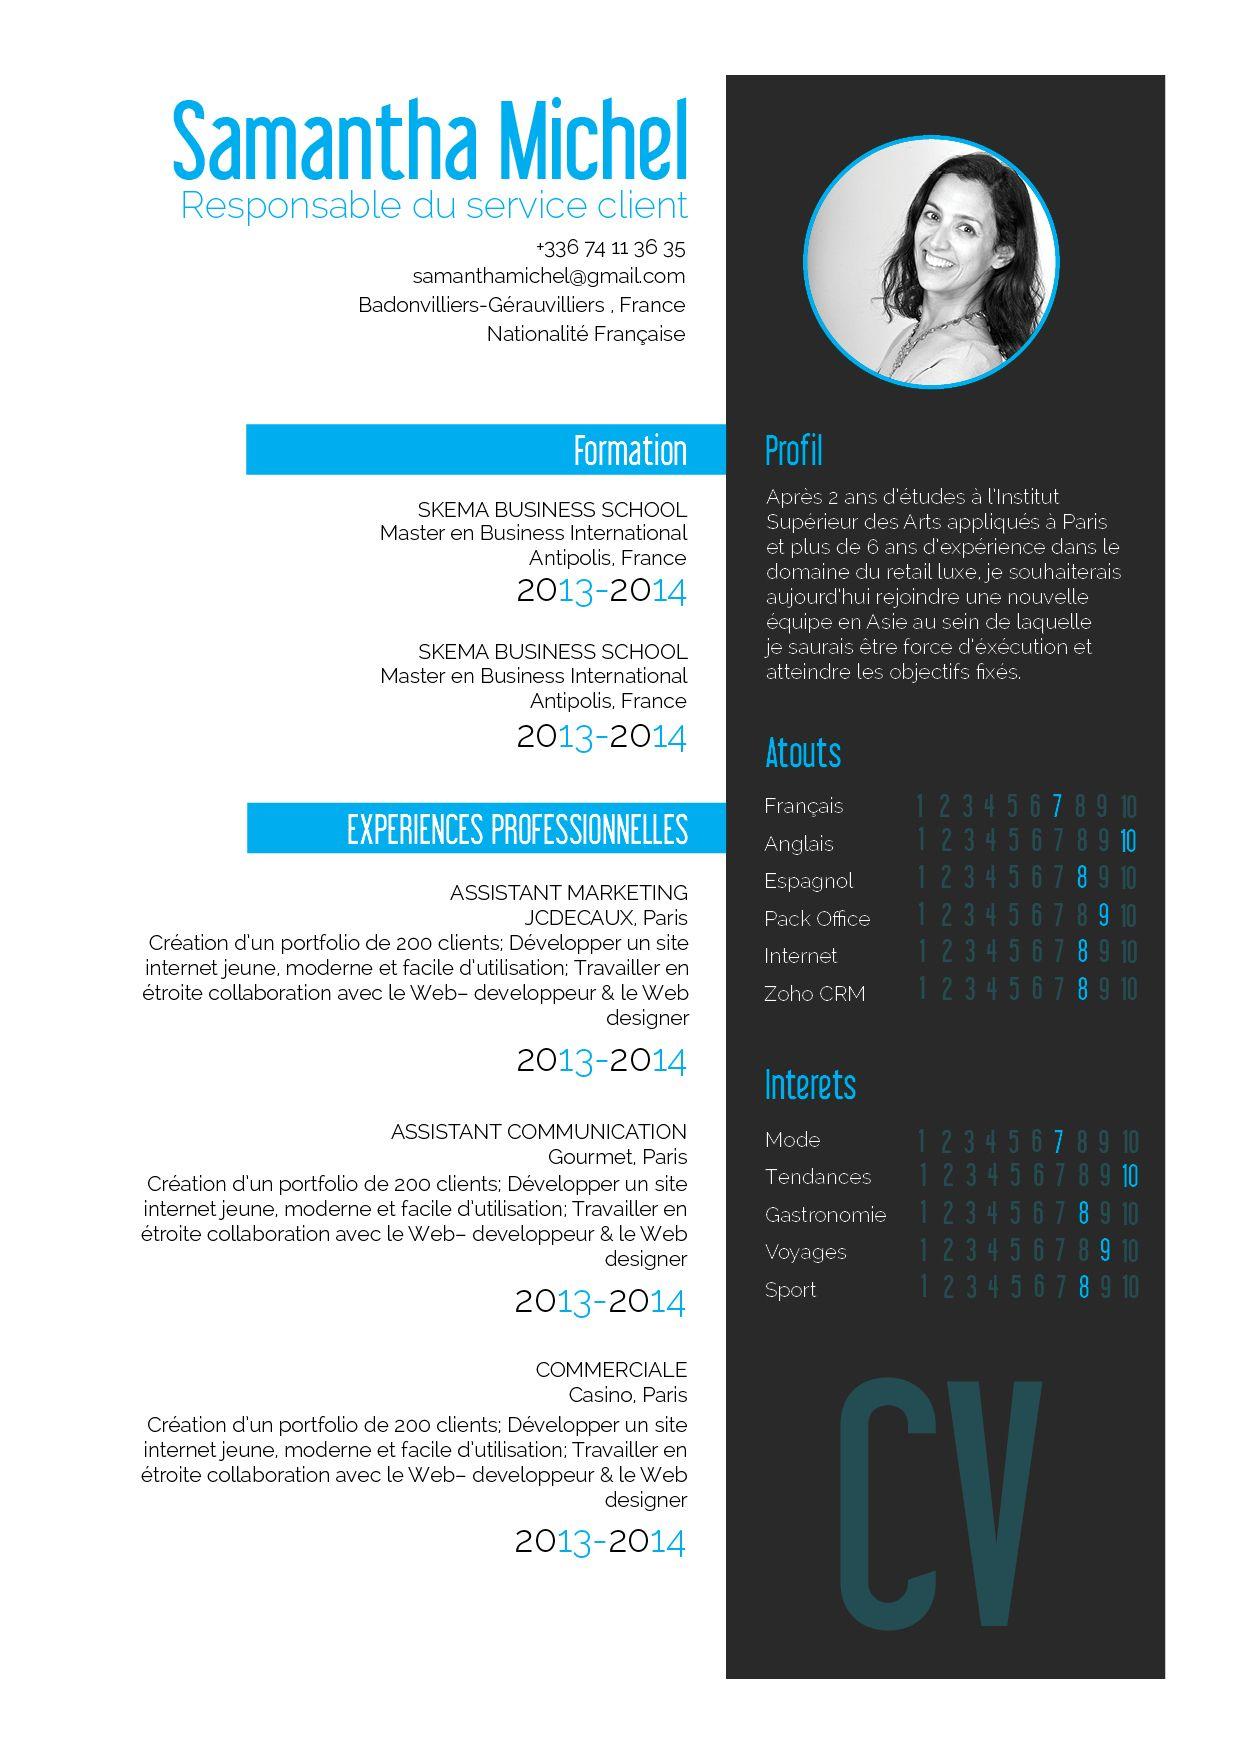 Vivace Un Cv Super Original Dont La Presentation Est Tres Propre Exemple Cv Modele De Cv Original Cv Secretaire